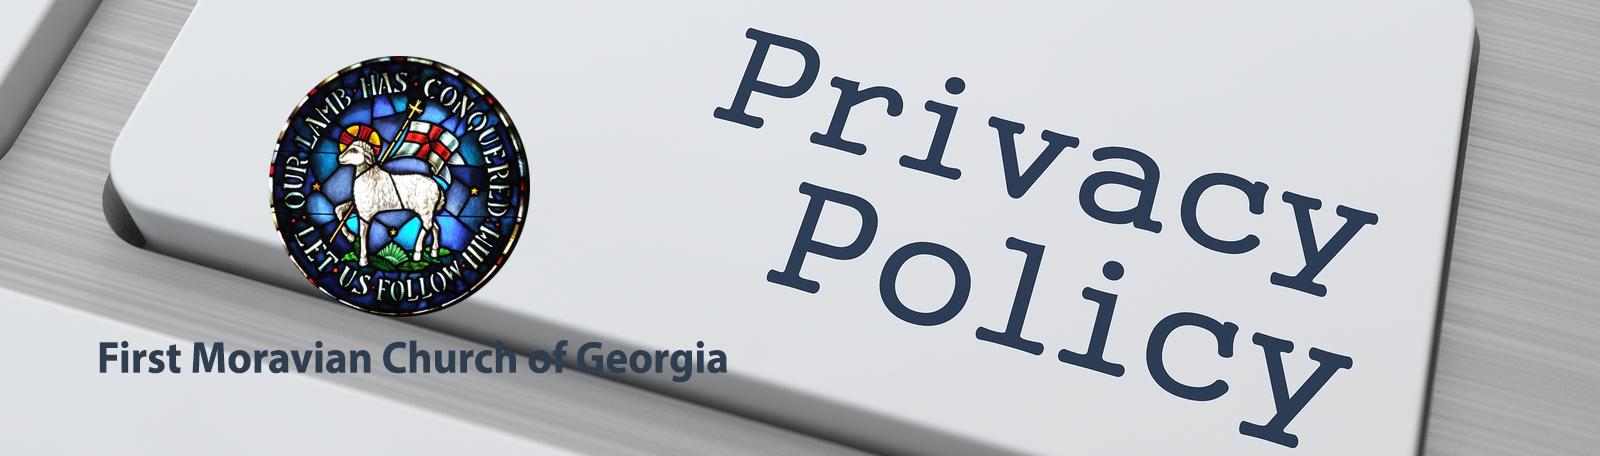 privacy-policy.jpg